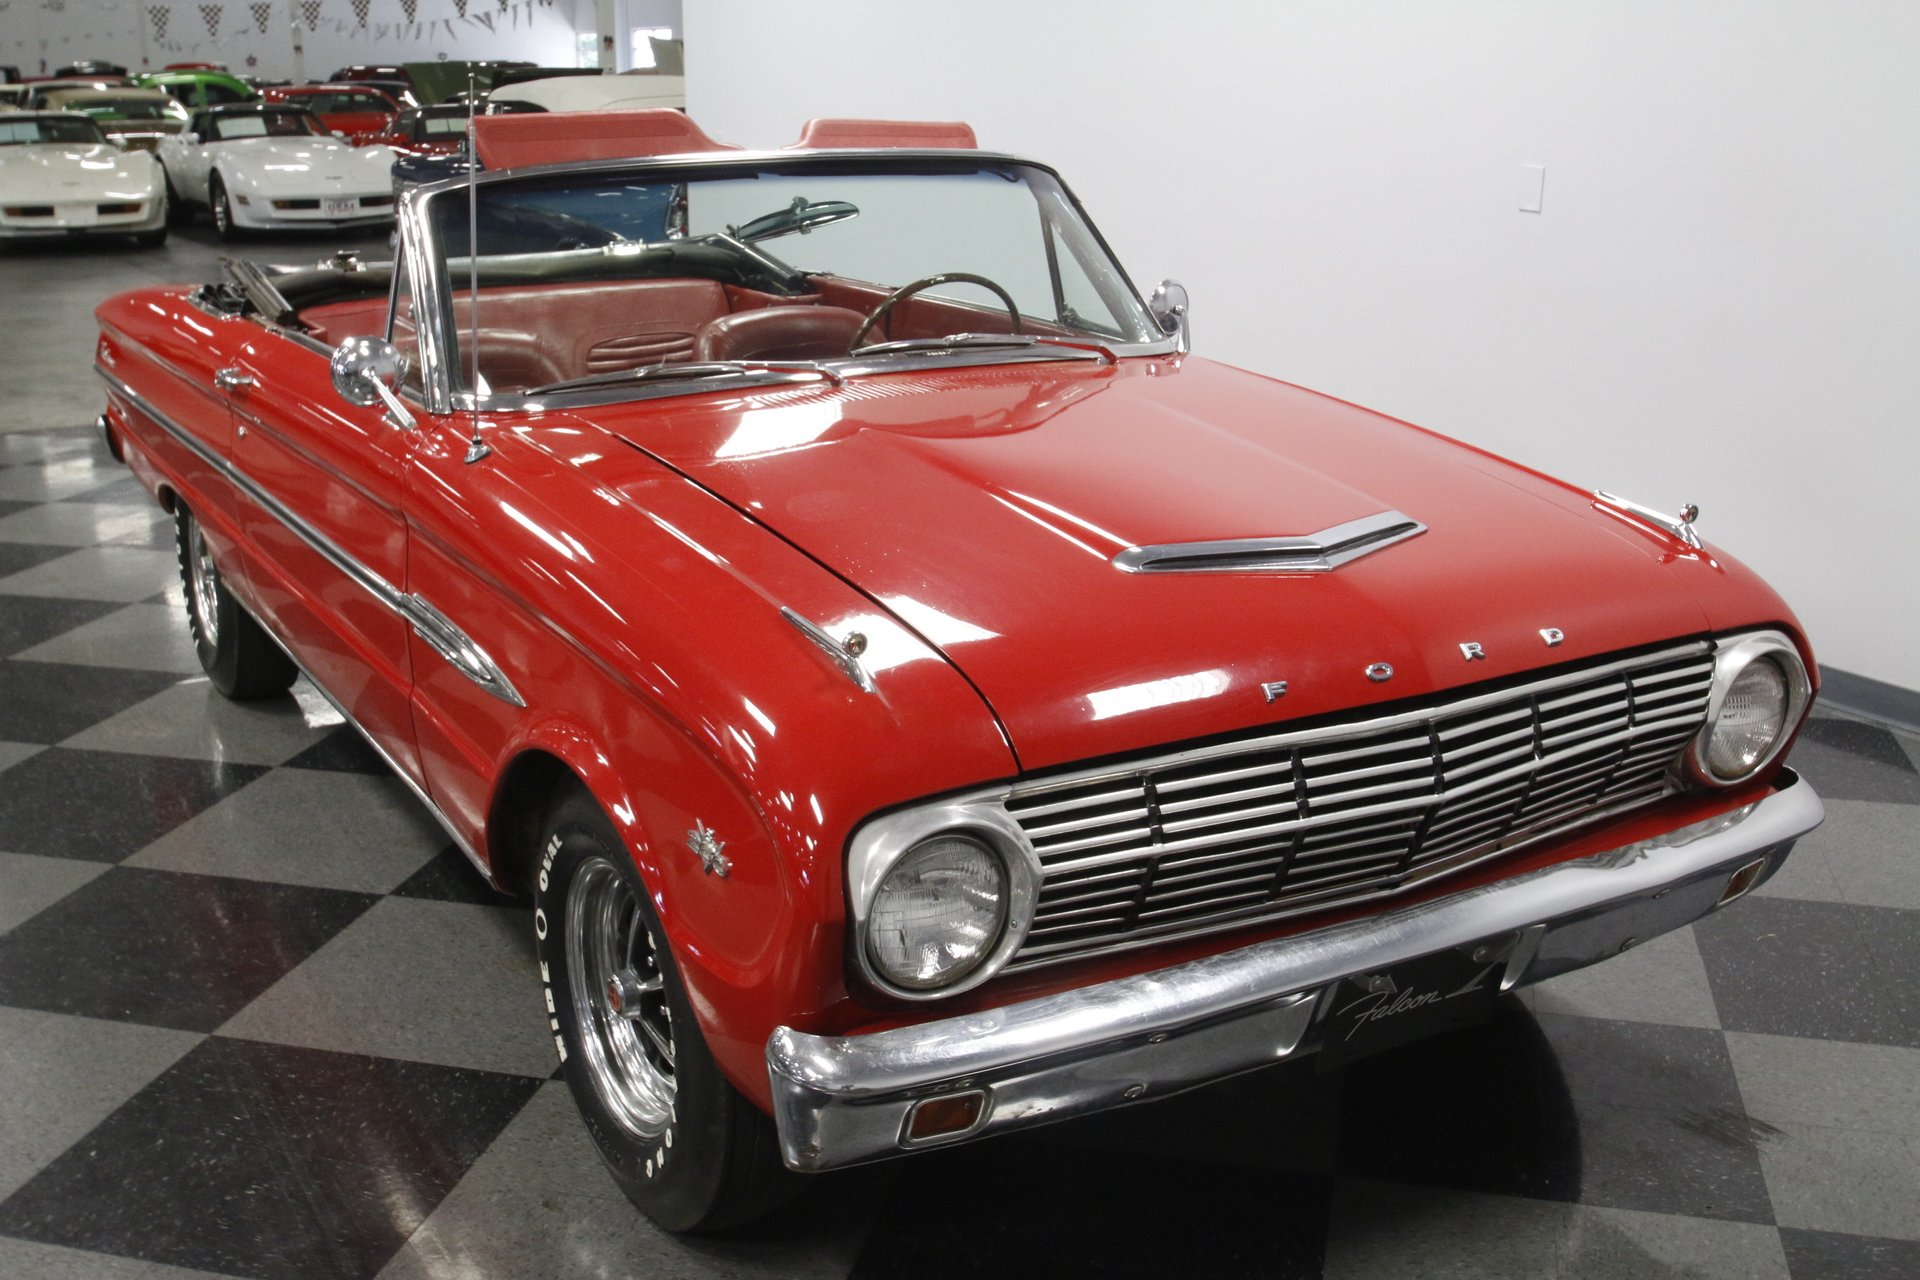 1963 Ford Falcon | Streetside Classics - The Nation's